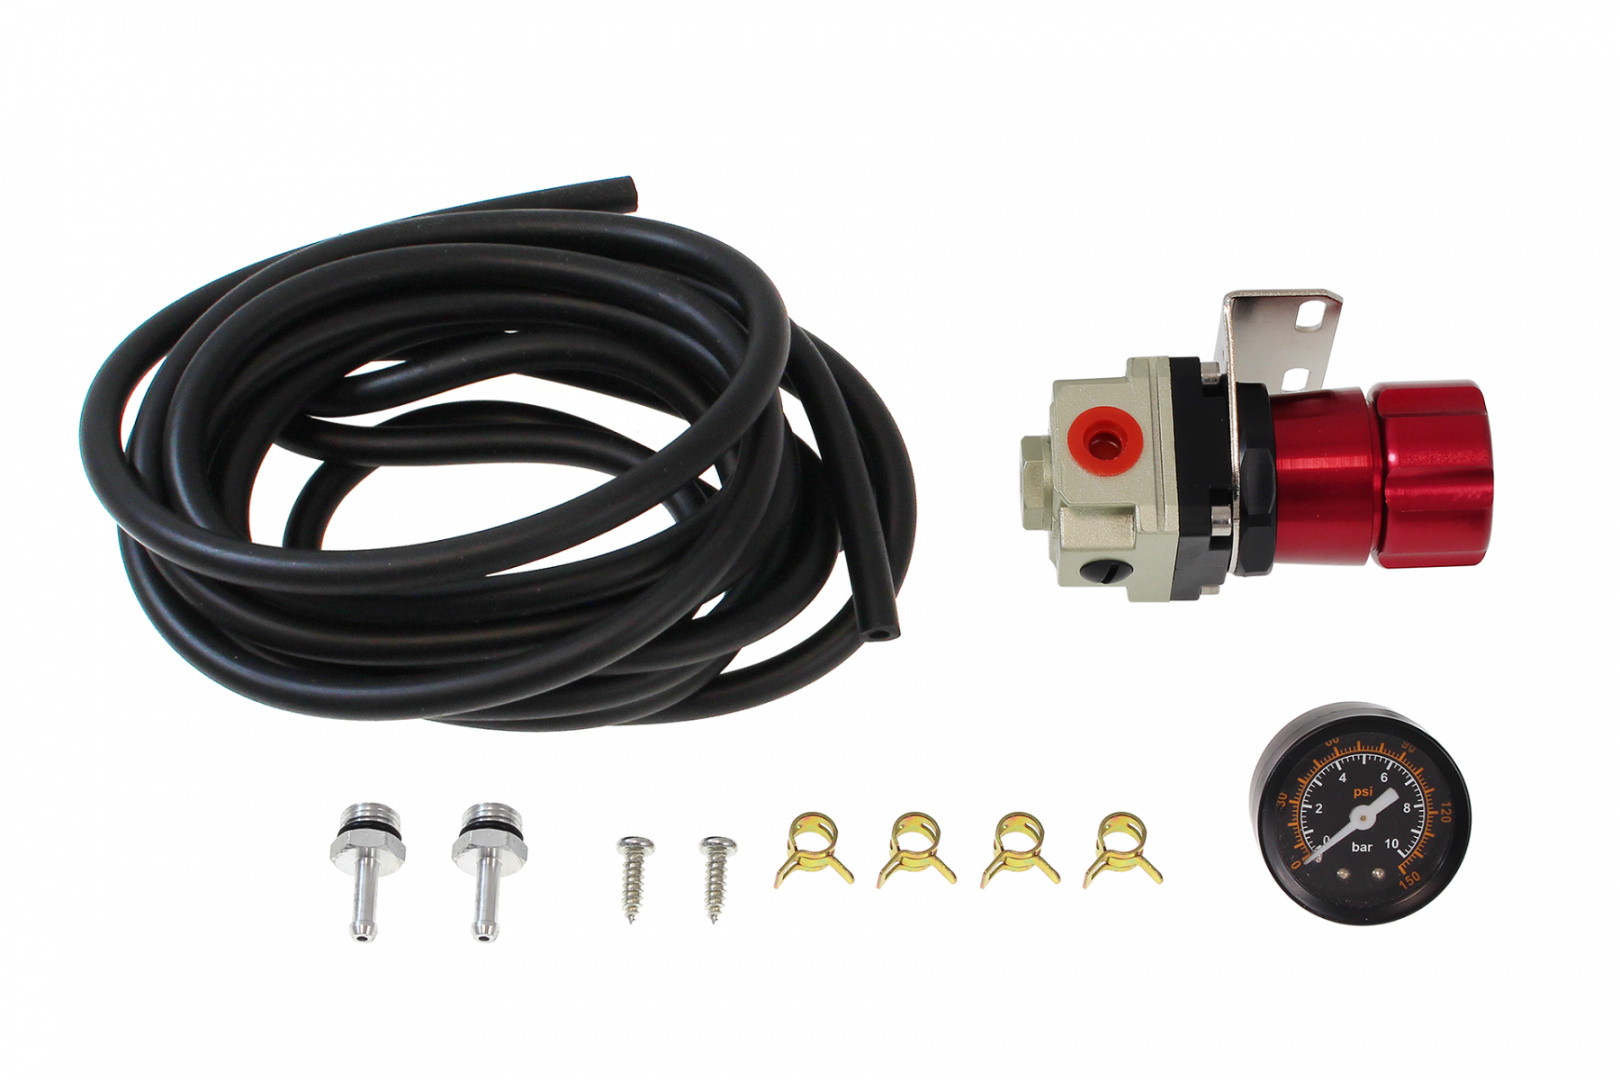 Zawór Manual Boost Controller TurboWorks BC02 Red - GRUBYGARAGE - Sklep Tuningowy